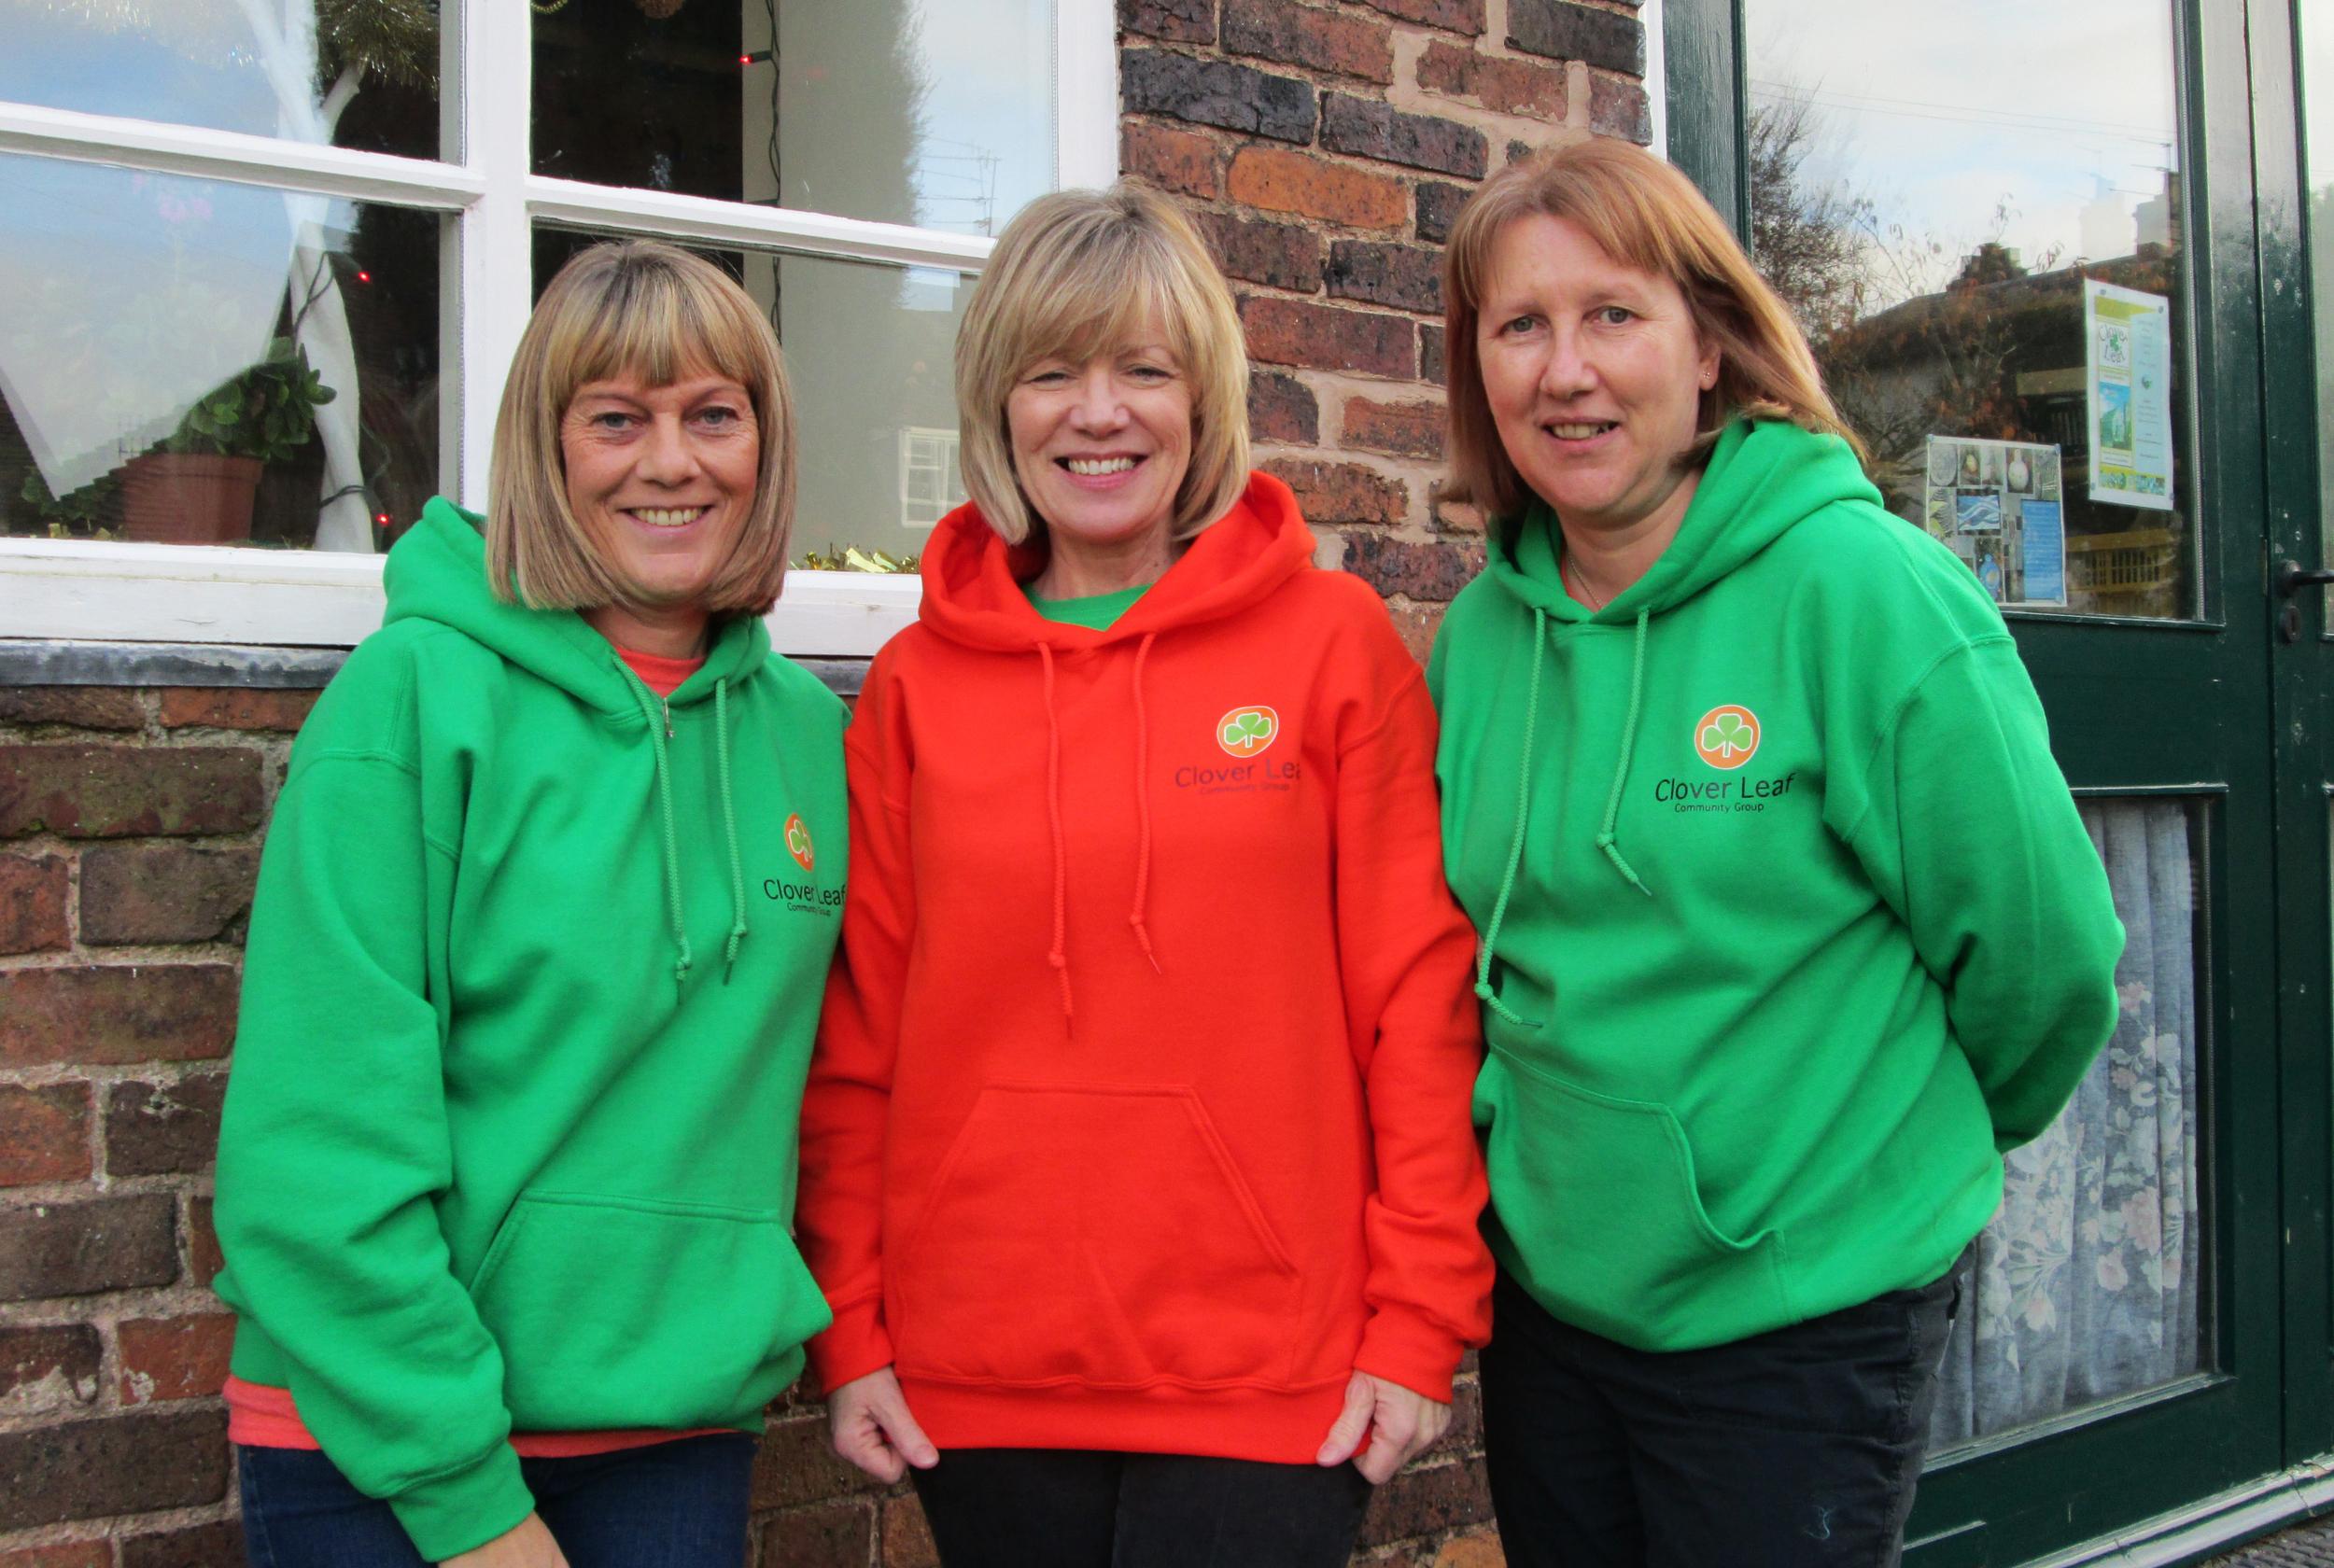 Tracey, Wendy and Sharlene